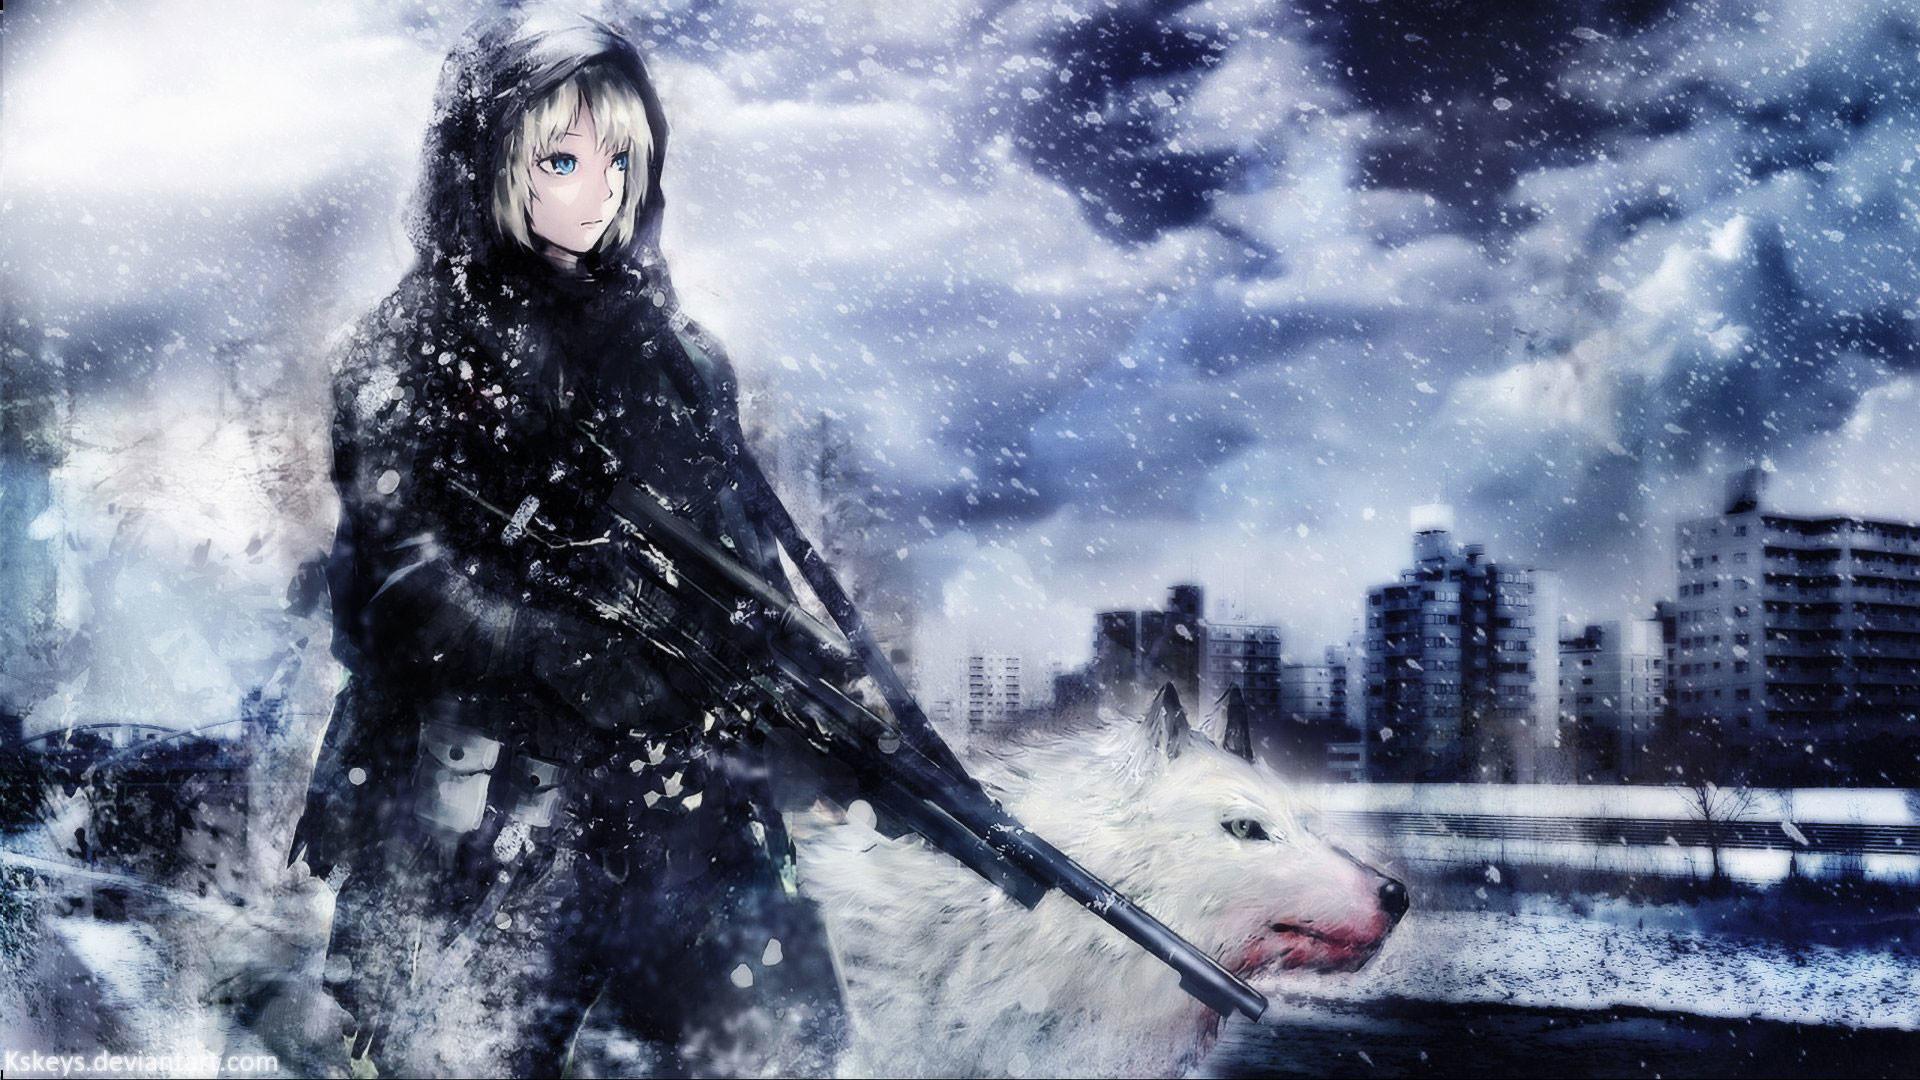 hd pics photos stunning girl white wolf gun weapon 3d animated hd quality desktop  background wallpaper